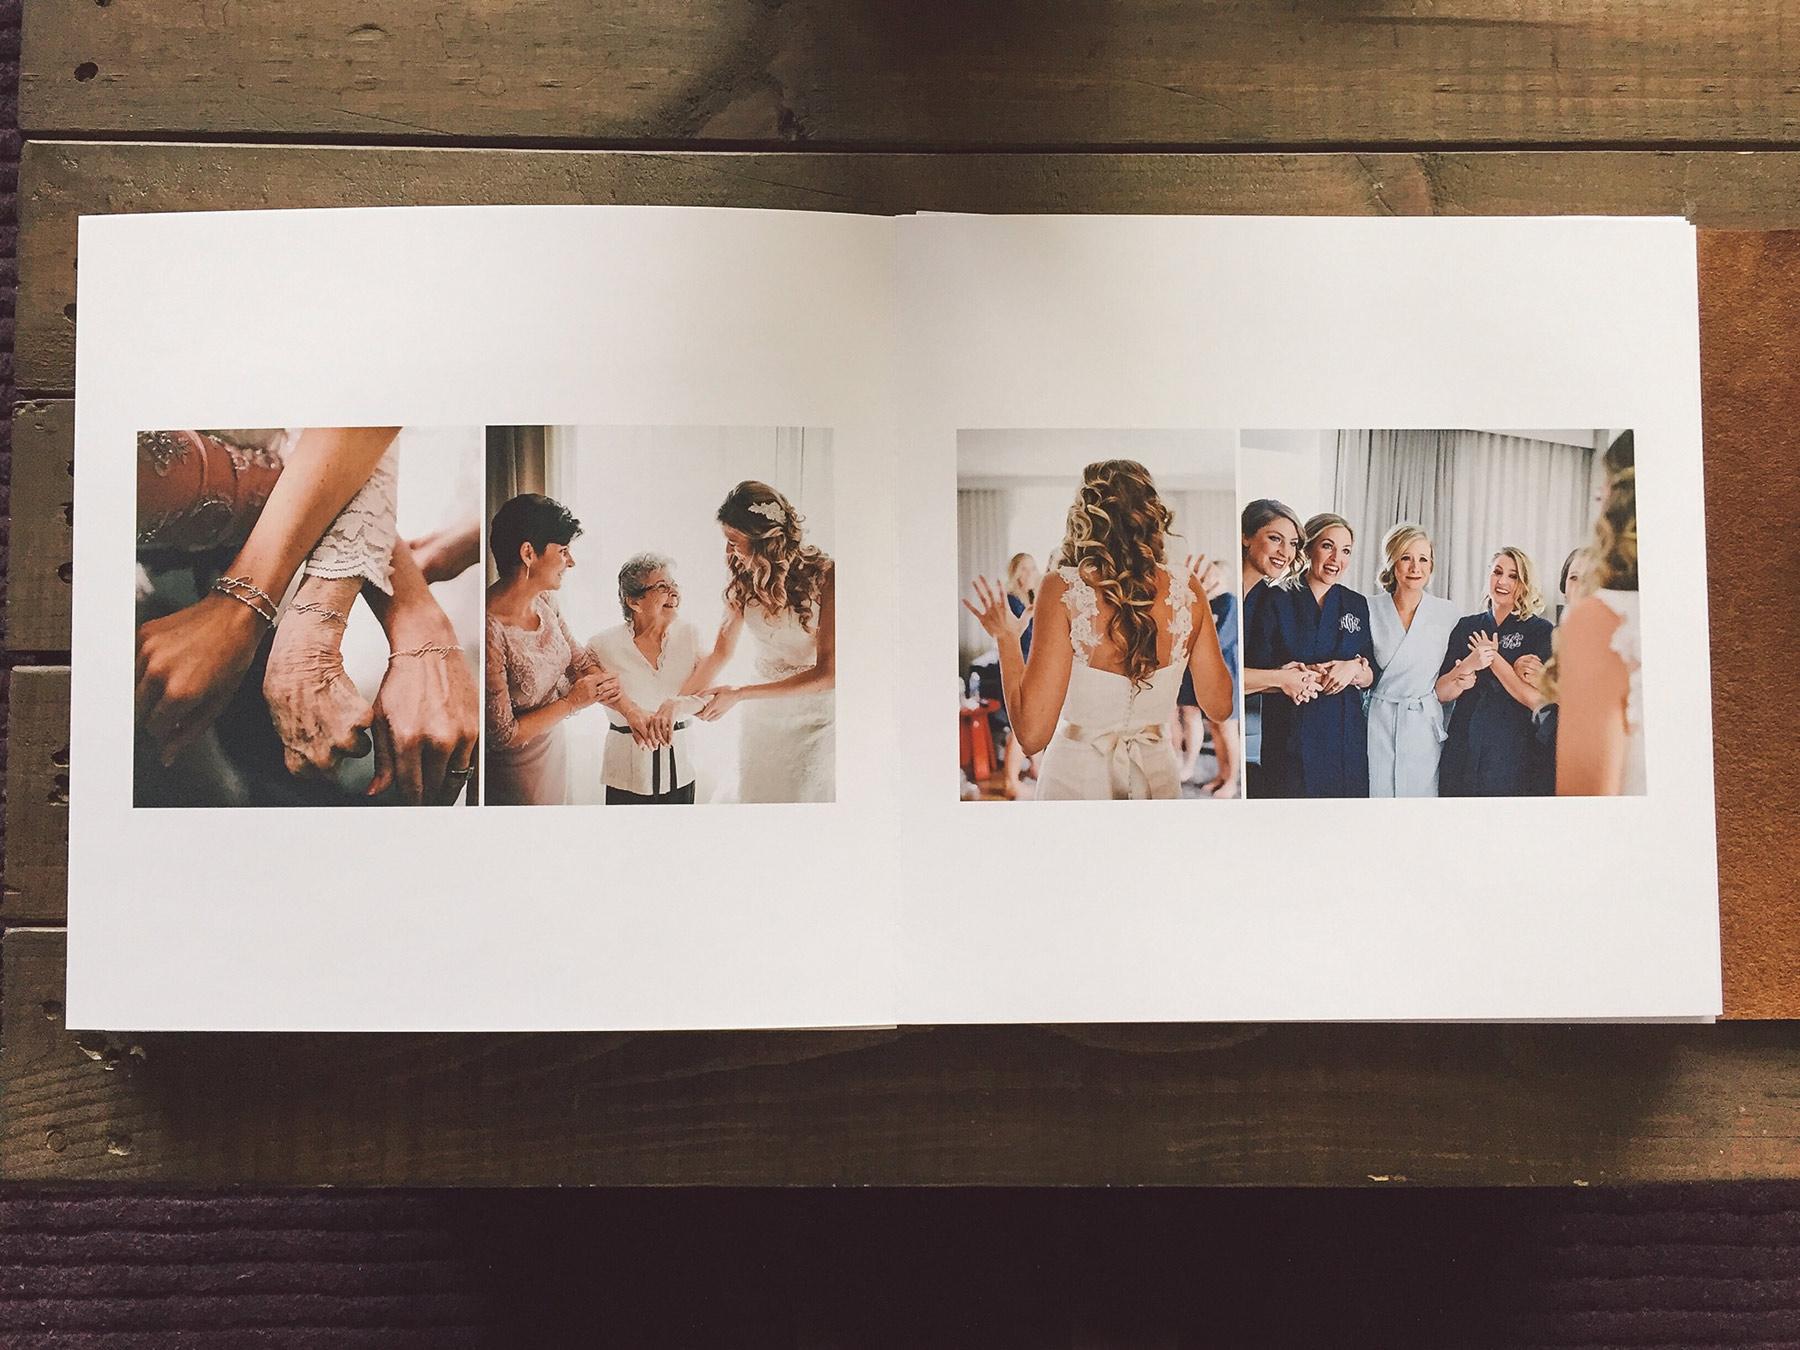 Vick-Photography-Album-Inside.jpg